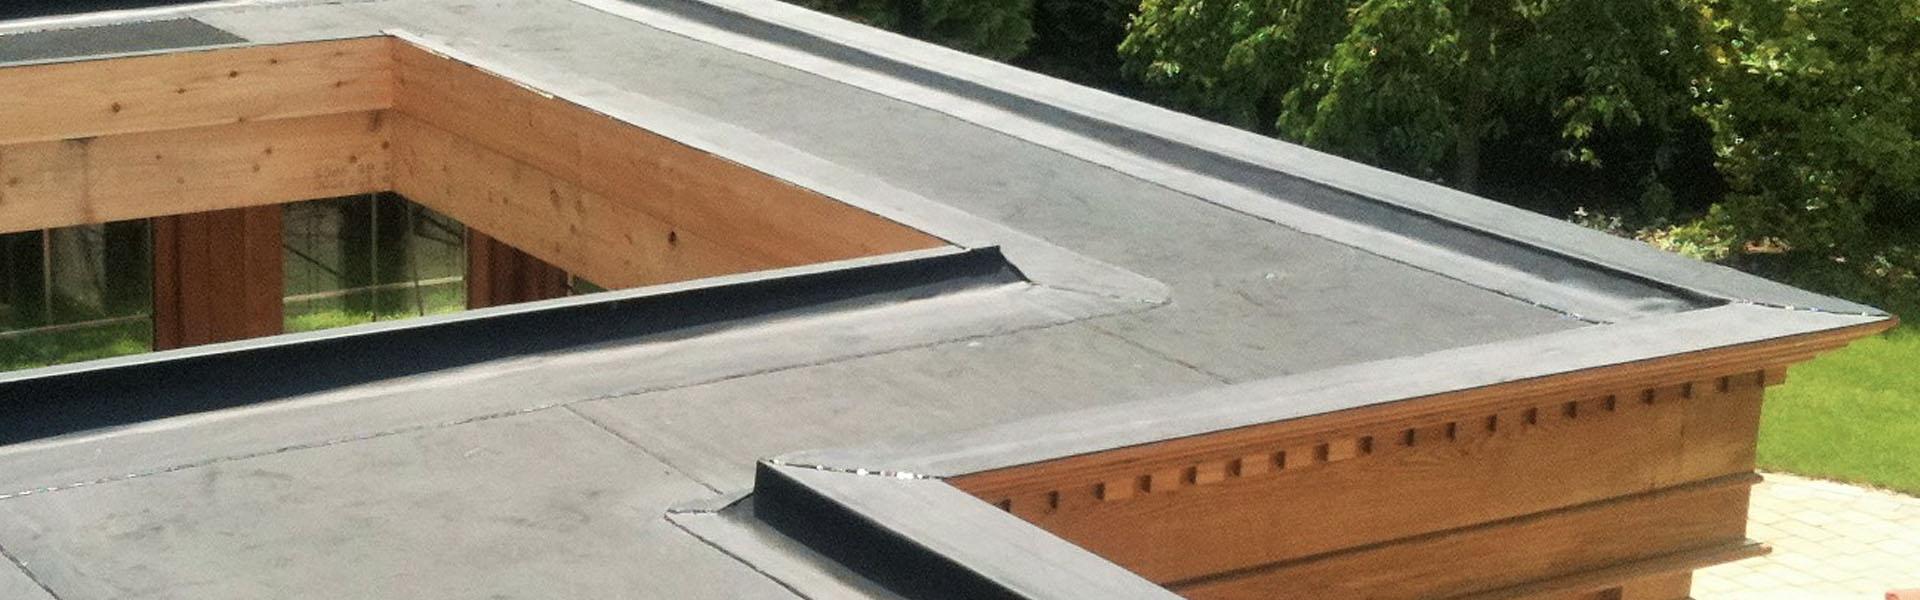 Resitrix EPDM Roofing